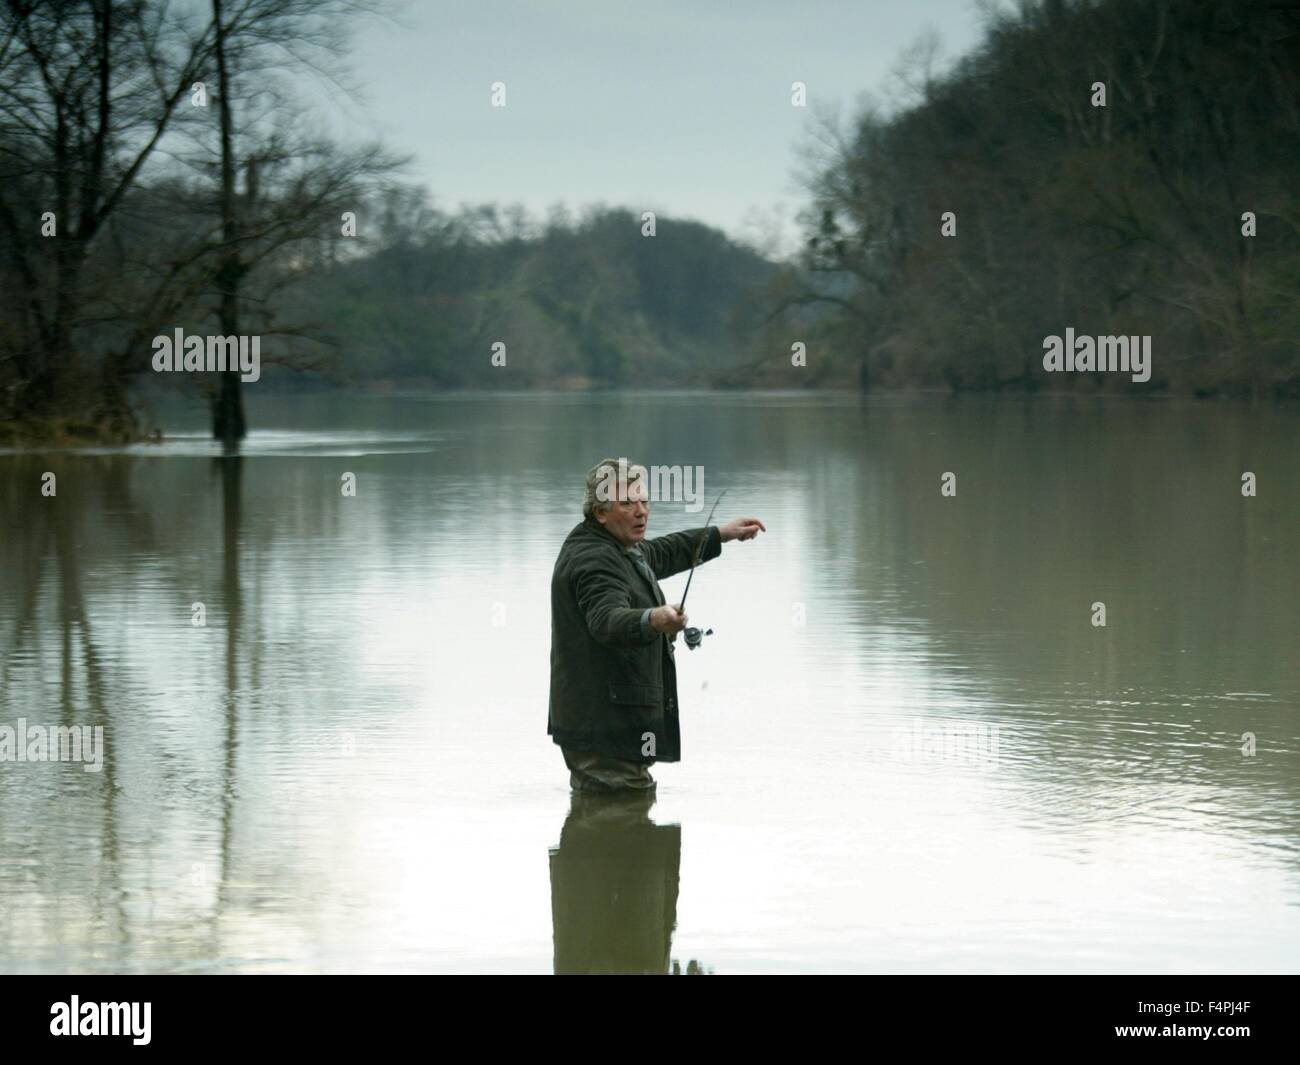 Albert Finney / Big Fish / 2003 dirigida por Tim Burton [Columbia Pictures] Imagen De Stock